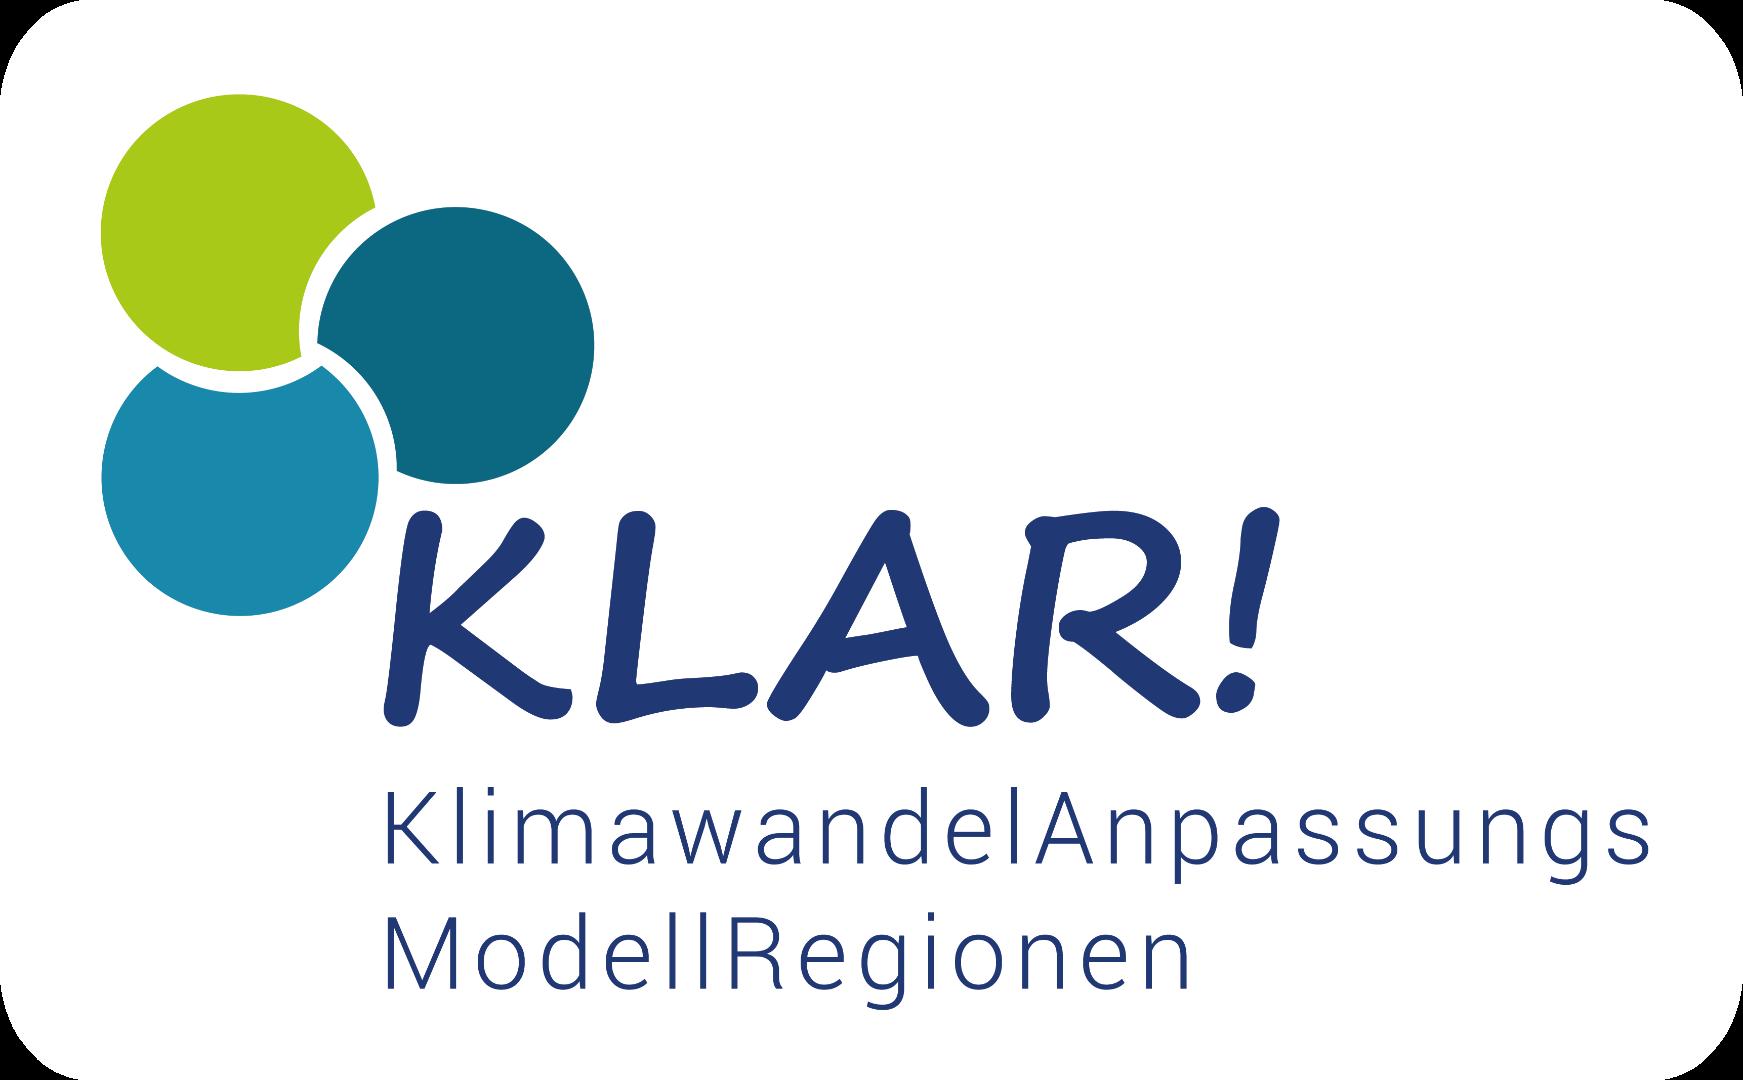 Klimawandelanpassungsmodellregion logo_web.png